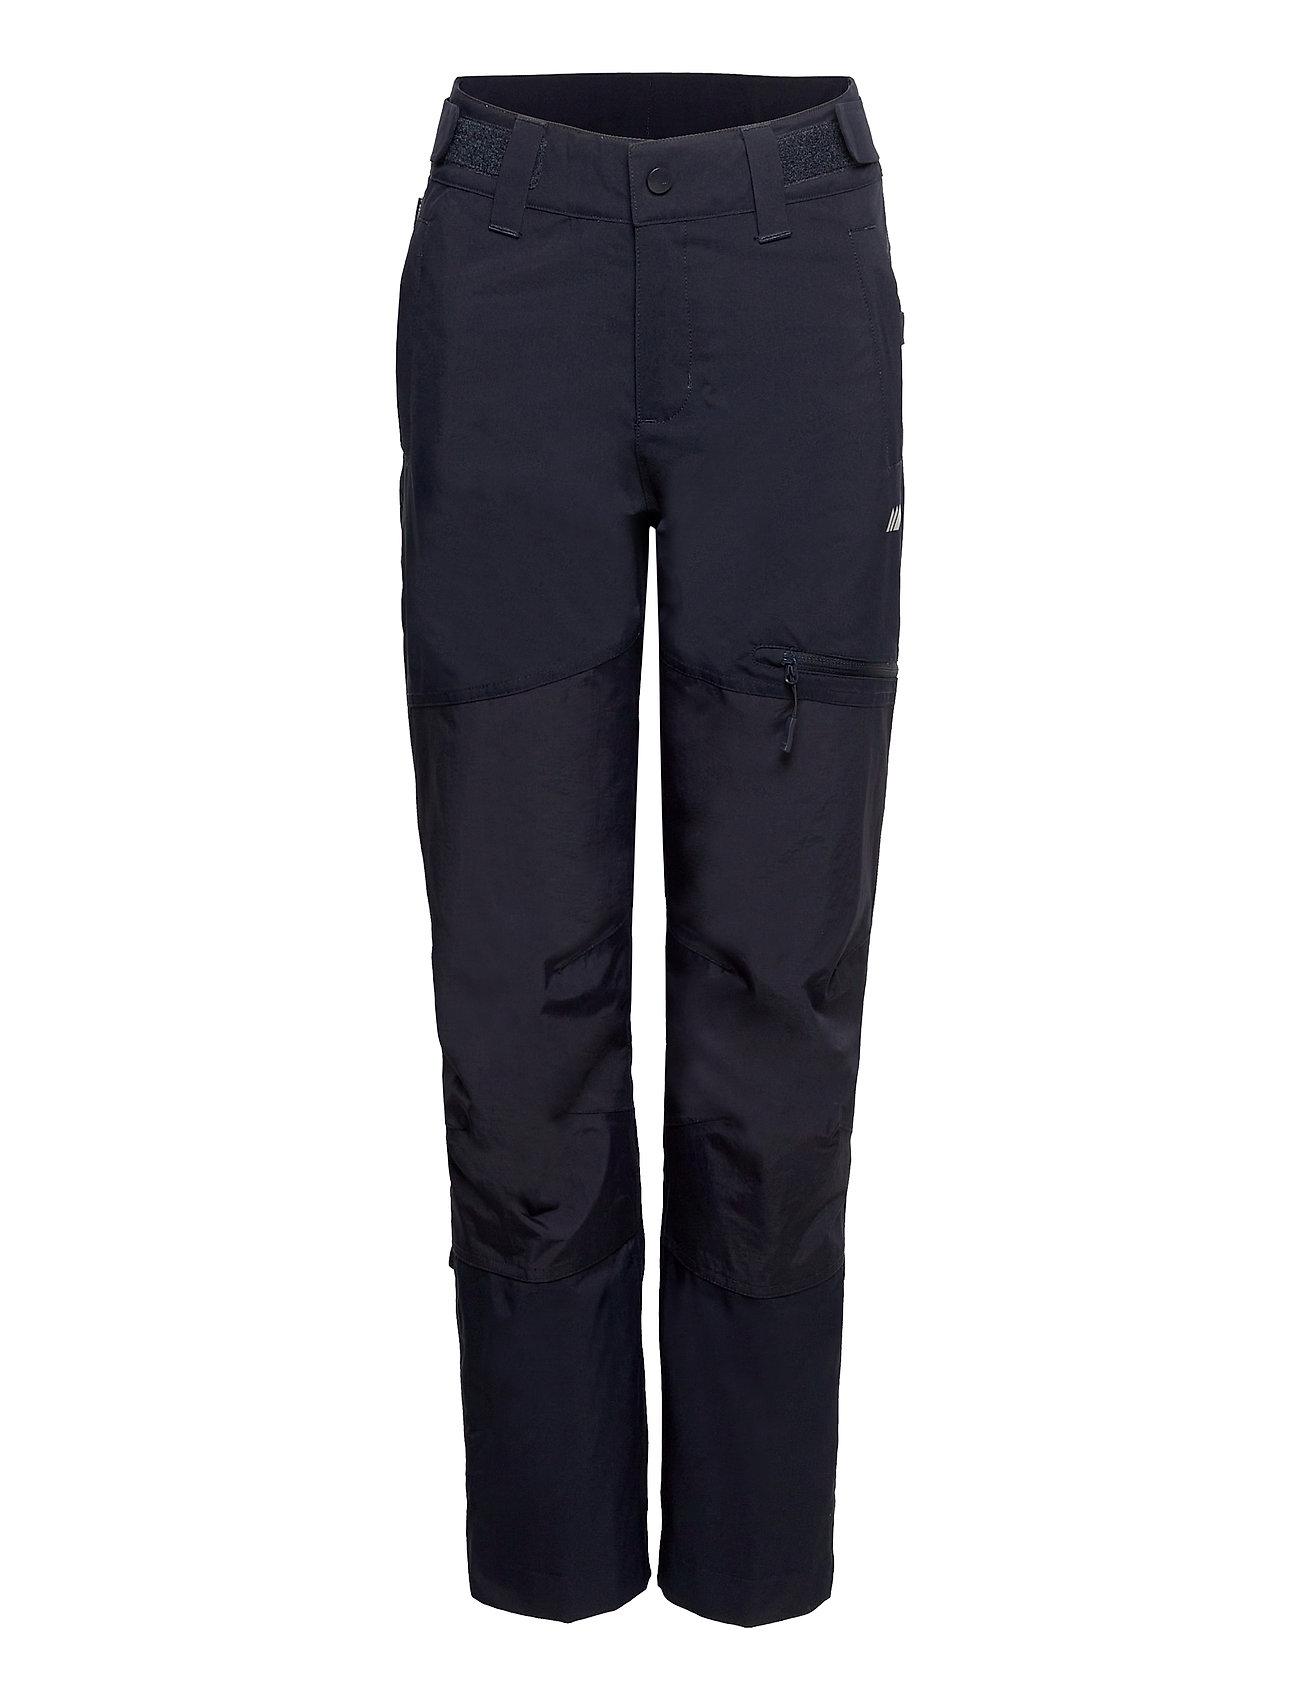 Gjendesheim 2-Layer Technical Trousers Outerwear Softshells Softshell Trousers Blå Skogstad